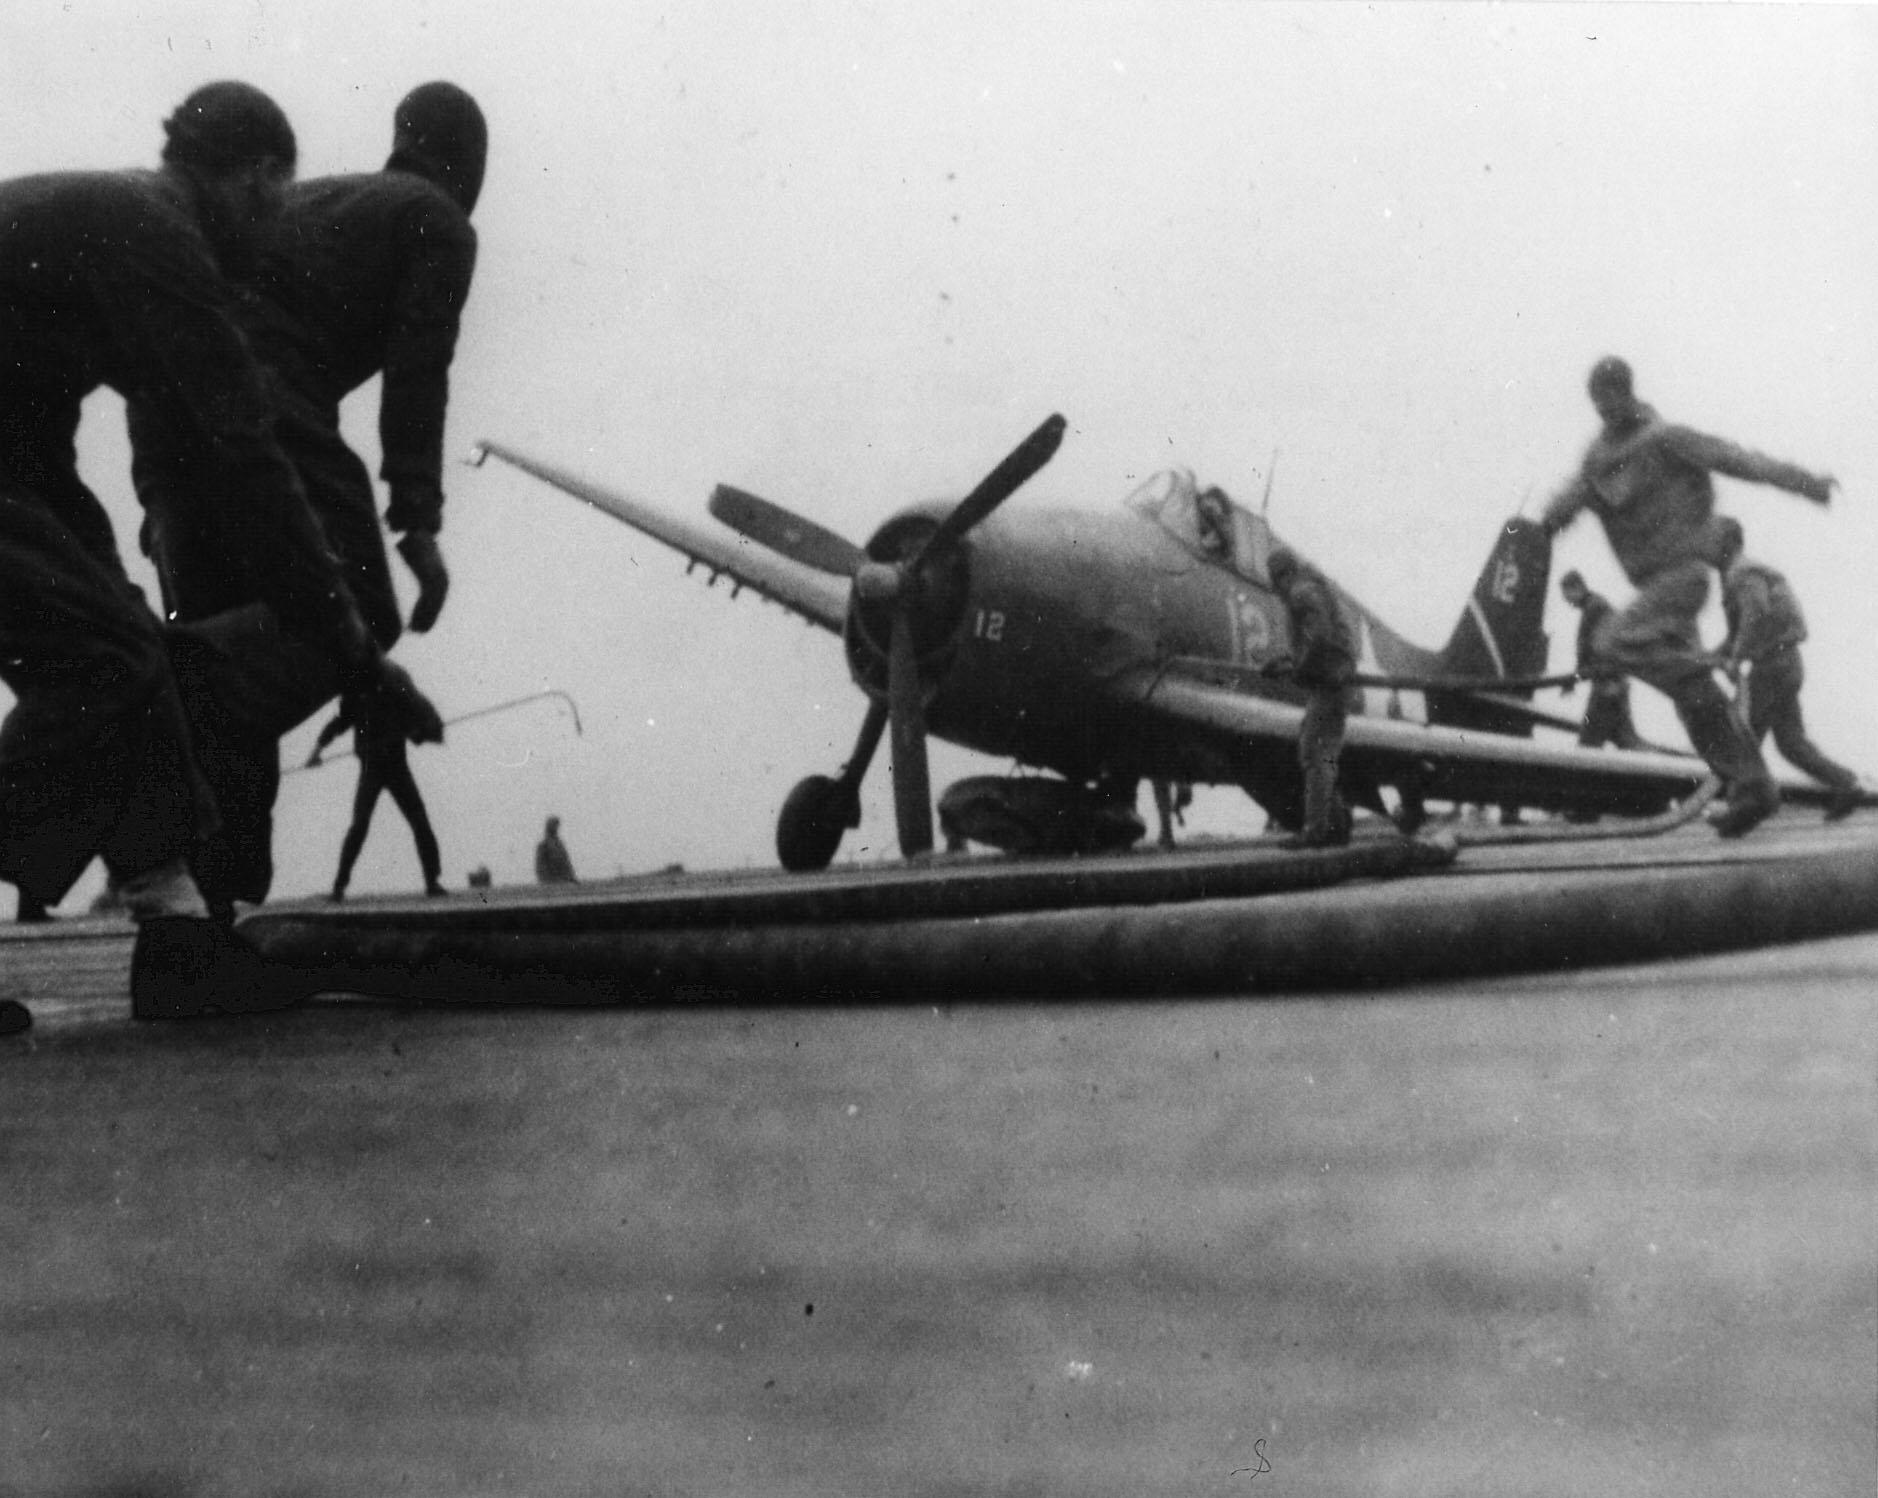 Grumman F6F 5 Hellcat VBF 3 White 12 landing with only one wheel gear down CV 10 USS Yorktown 1945 01